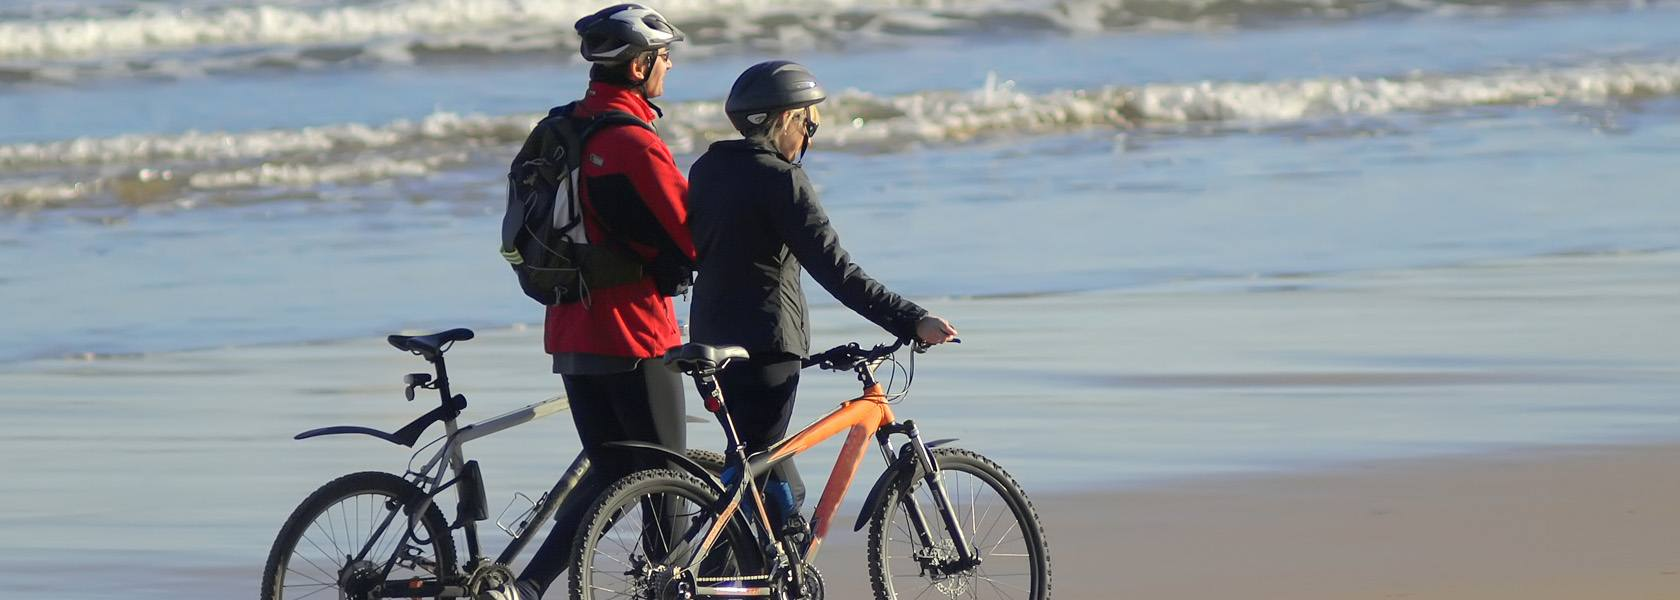 Radfahren an der Nordsee, © Marco Antonio Fdez. - Fotolia.com